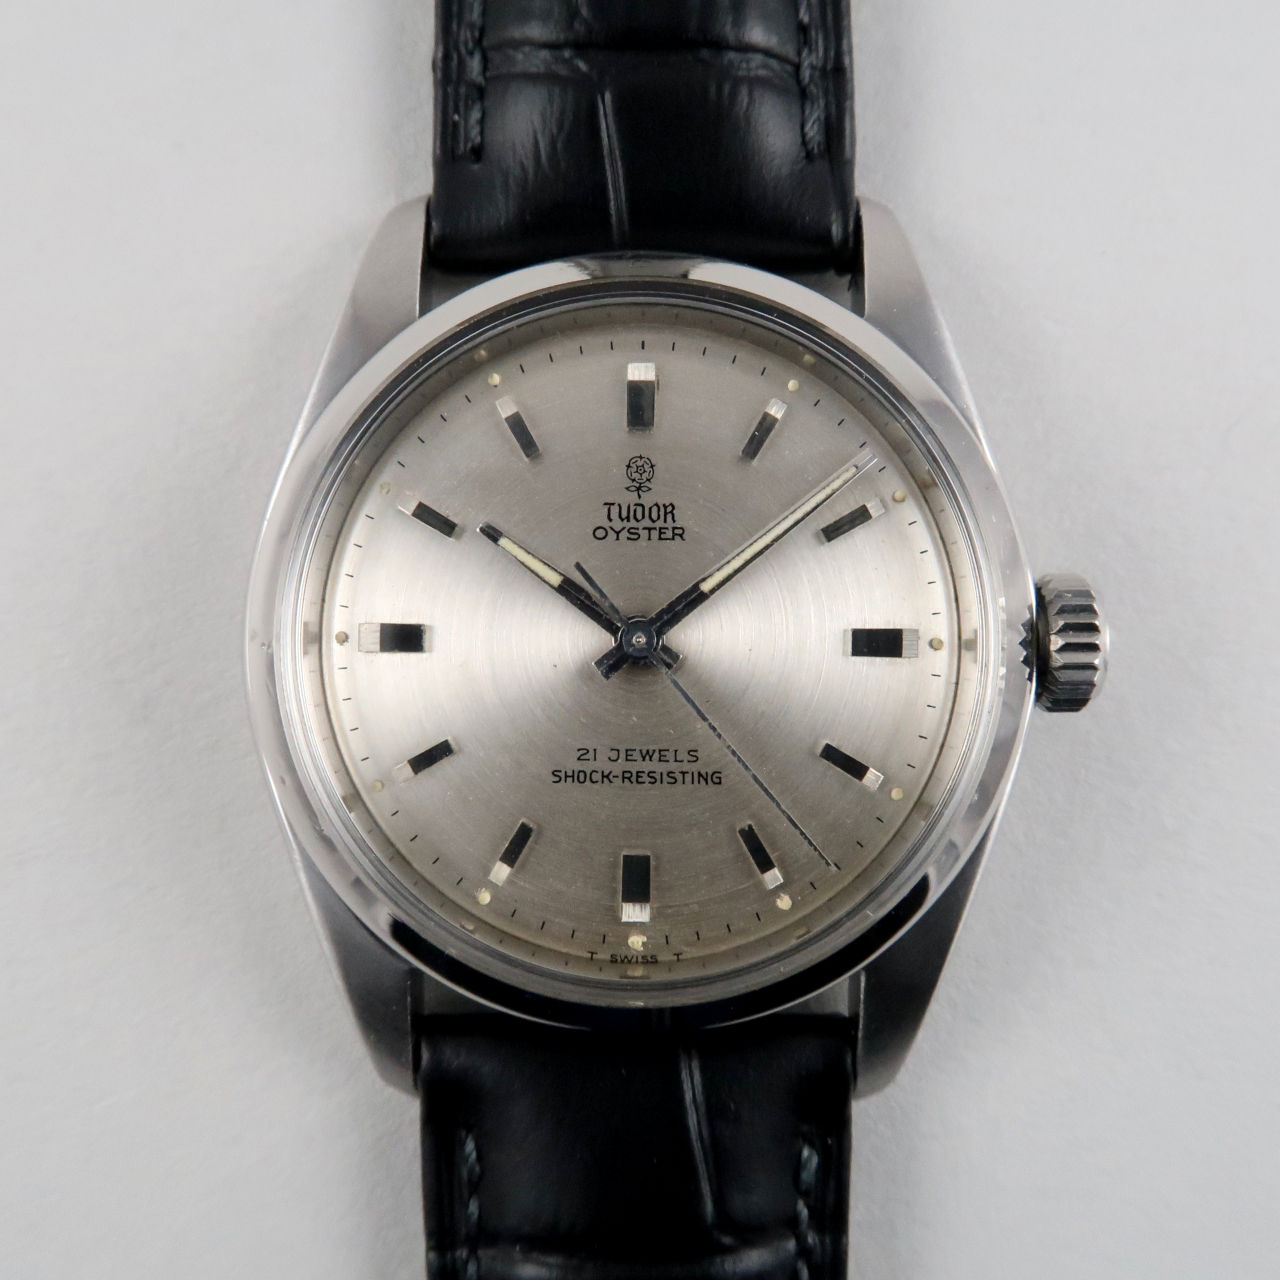 Tudor Oyster Ref. 7934 steel vintage wristwatch, circa 1964